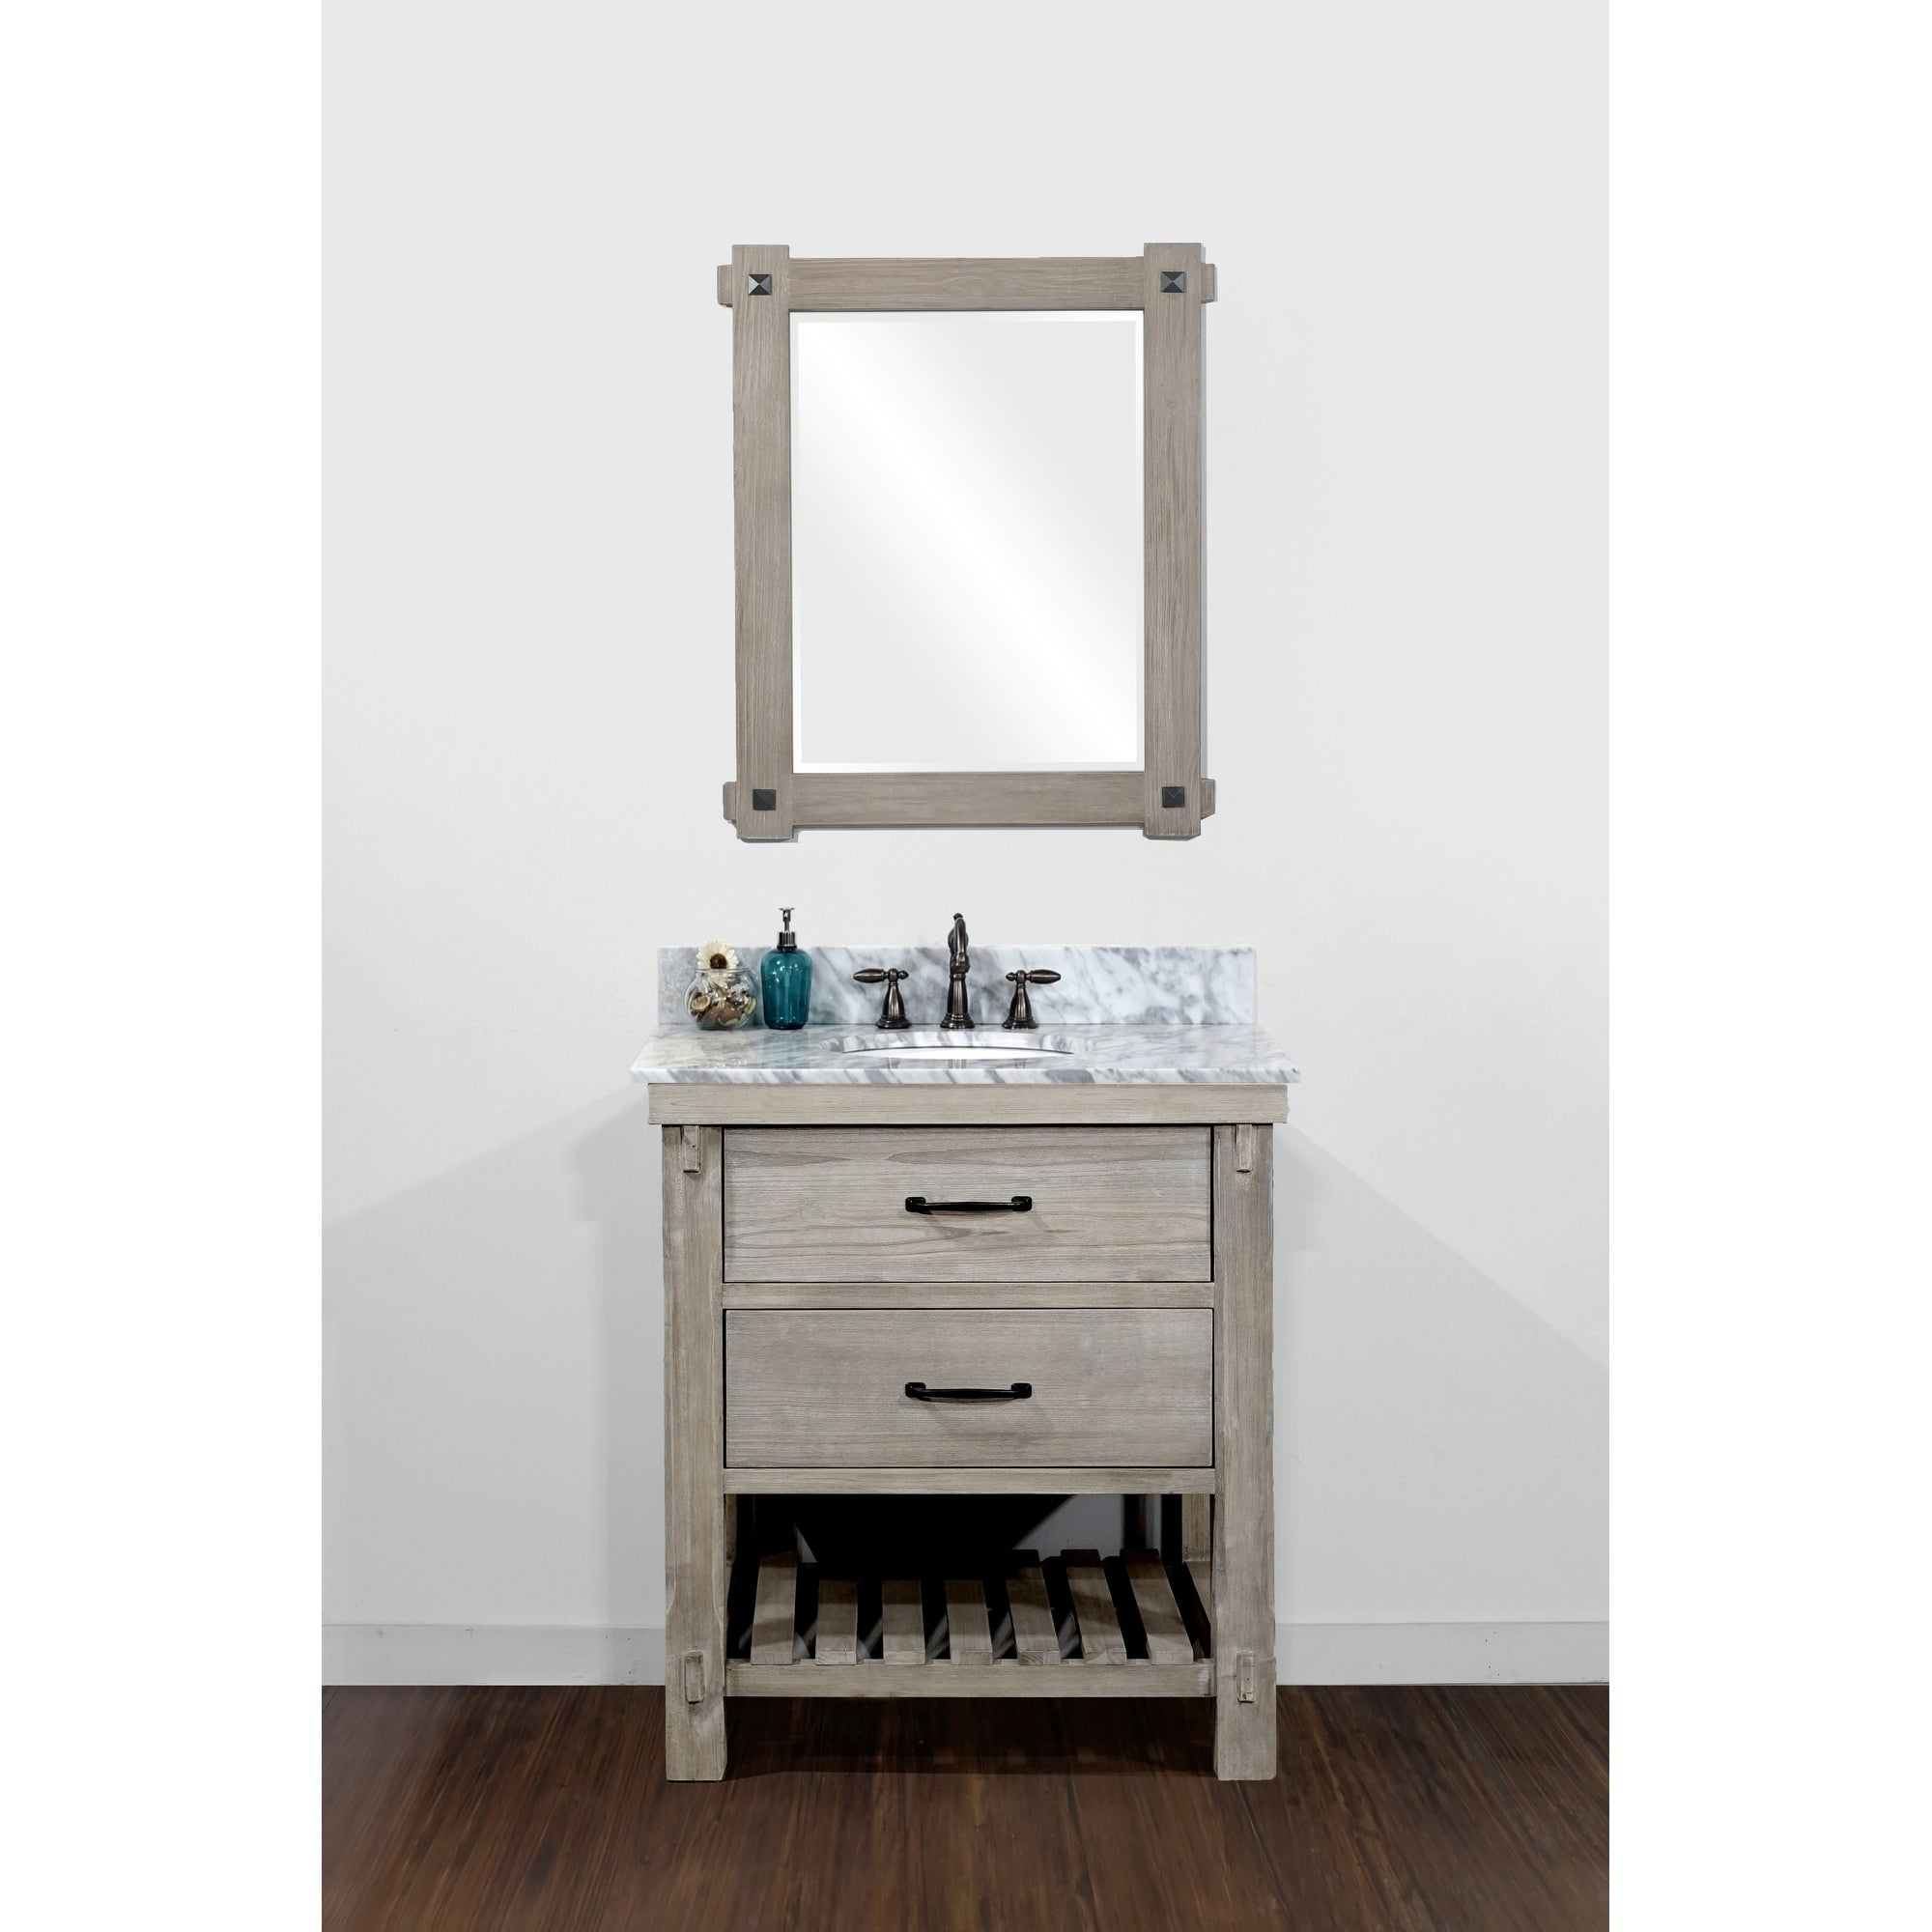 Infurniture Rustic Style 30 Inch Single Sink Bathroom Vanity Overstock 13189378